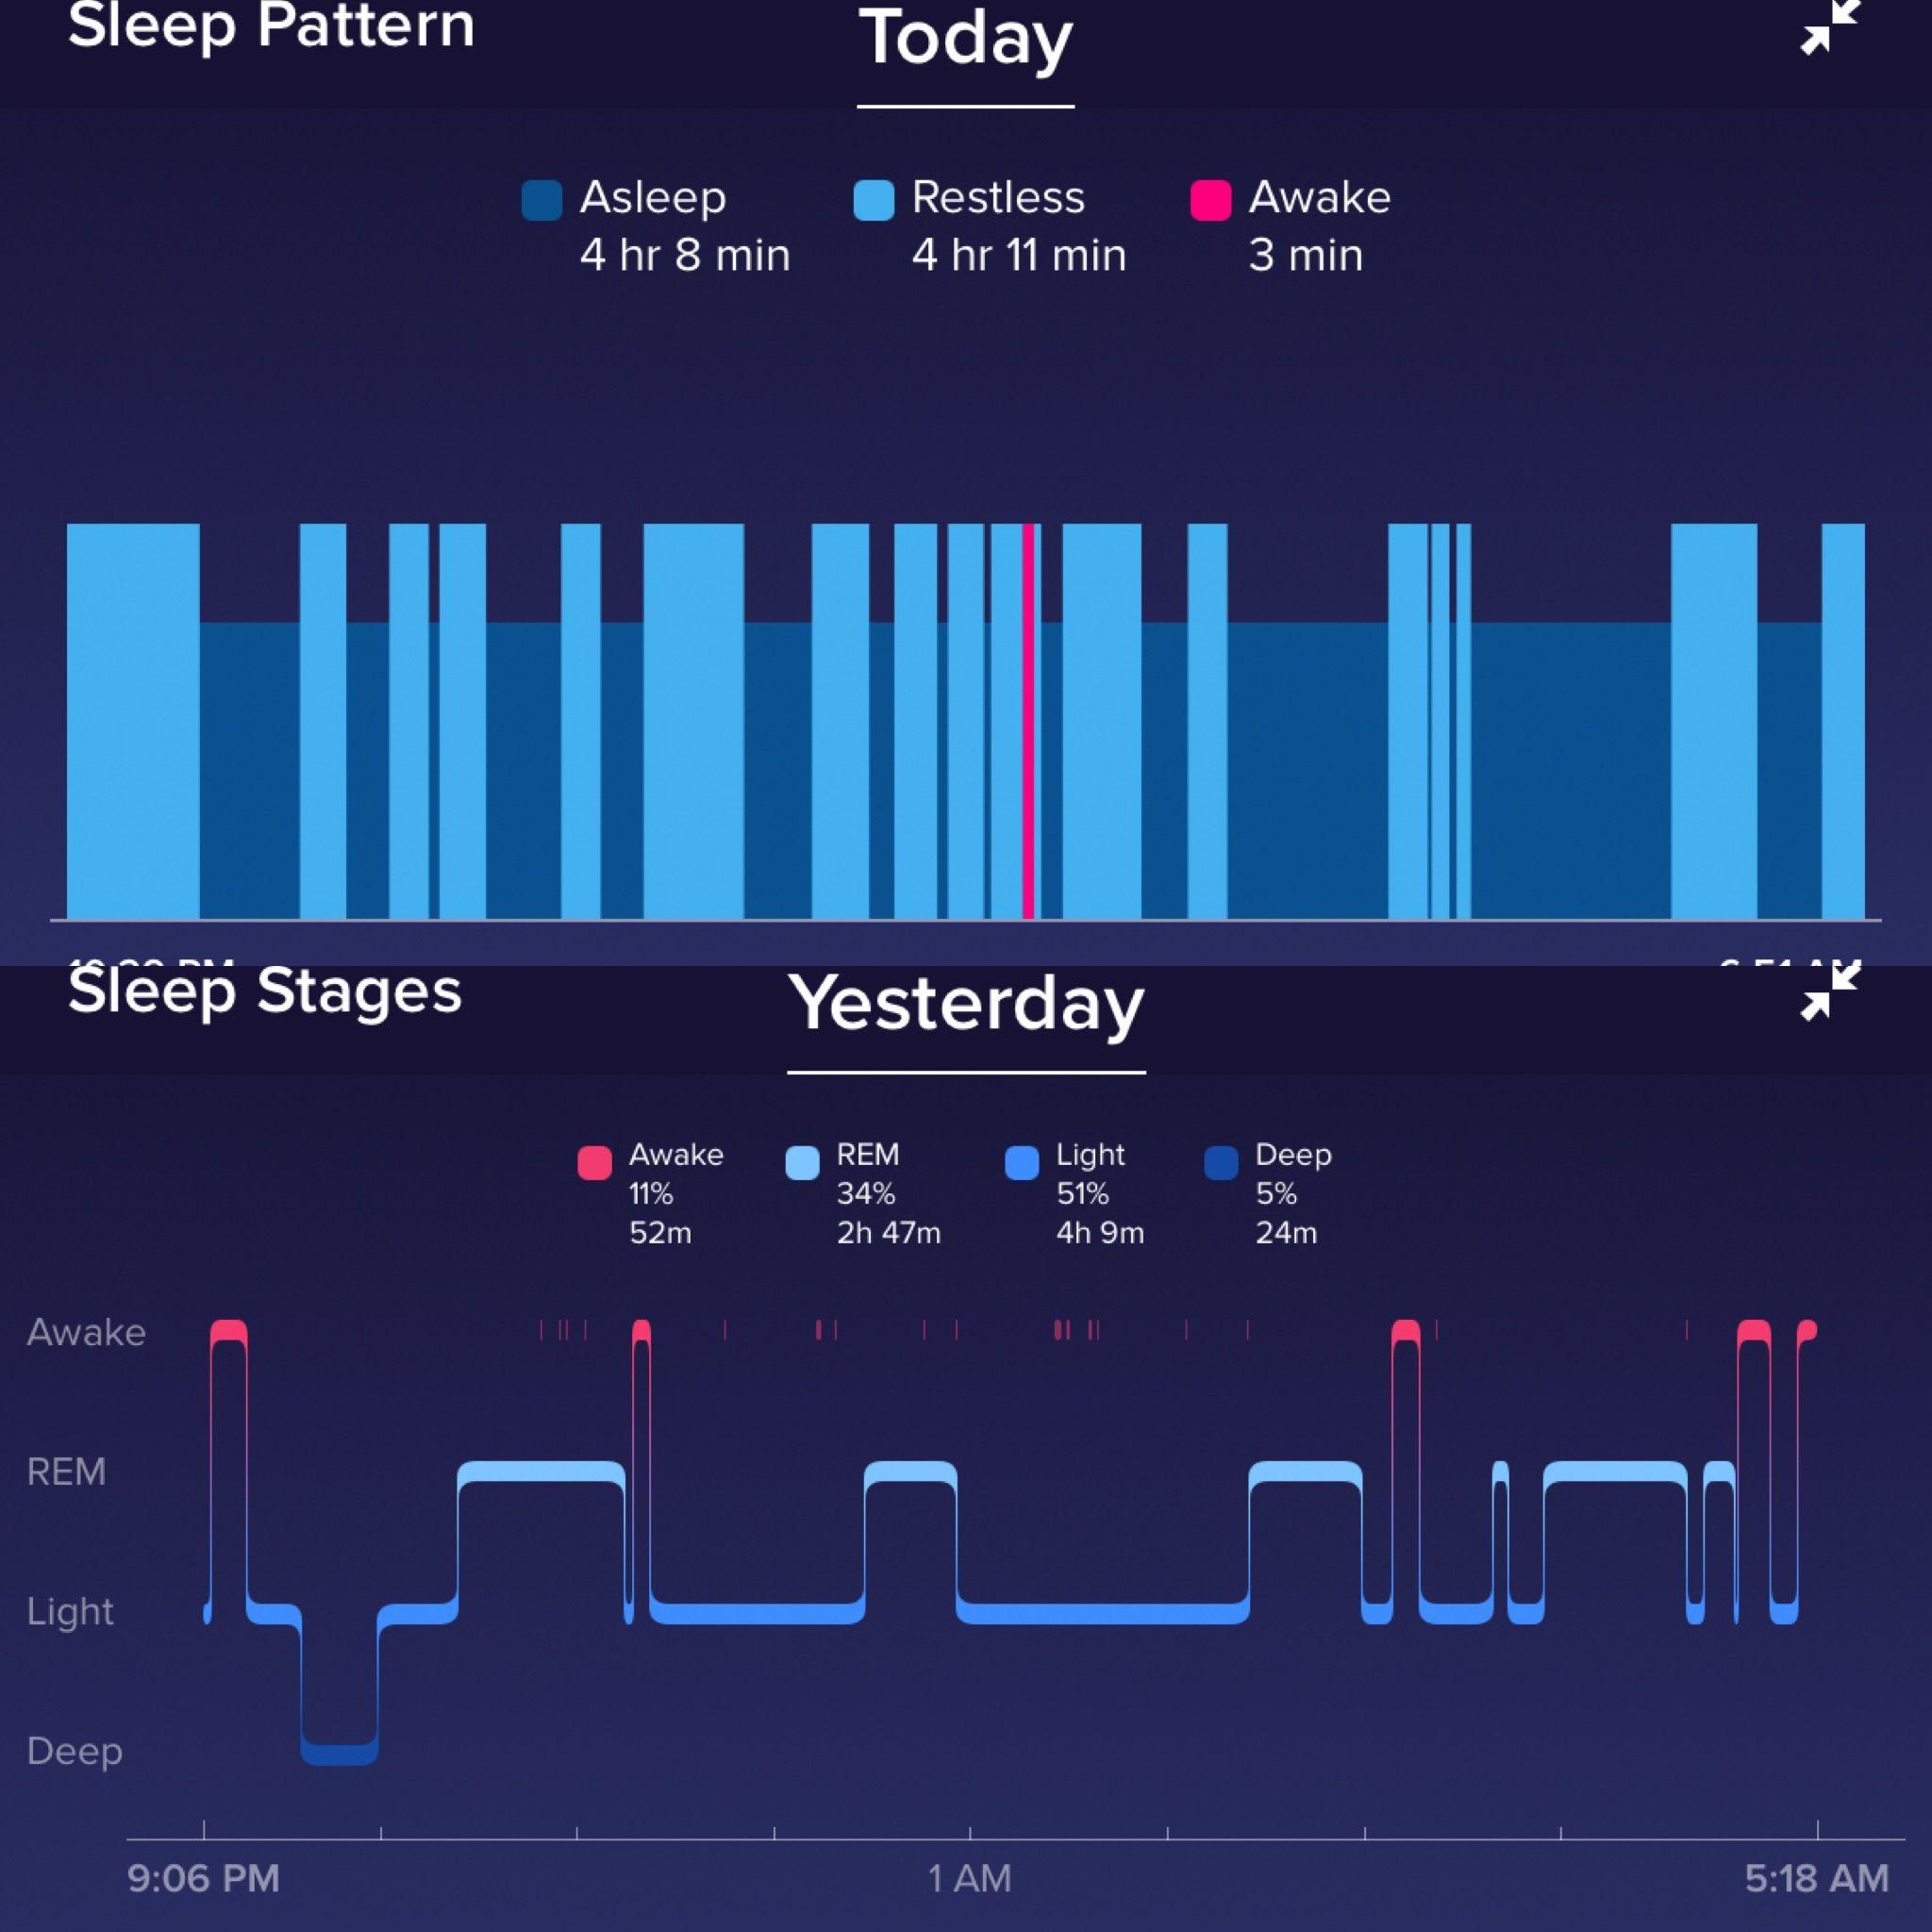 Sleep tracking reverted to